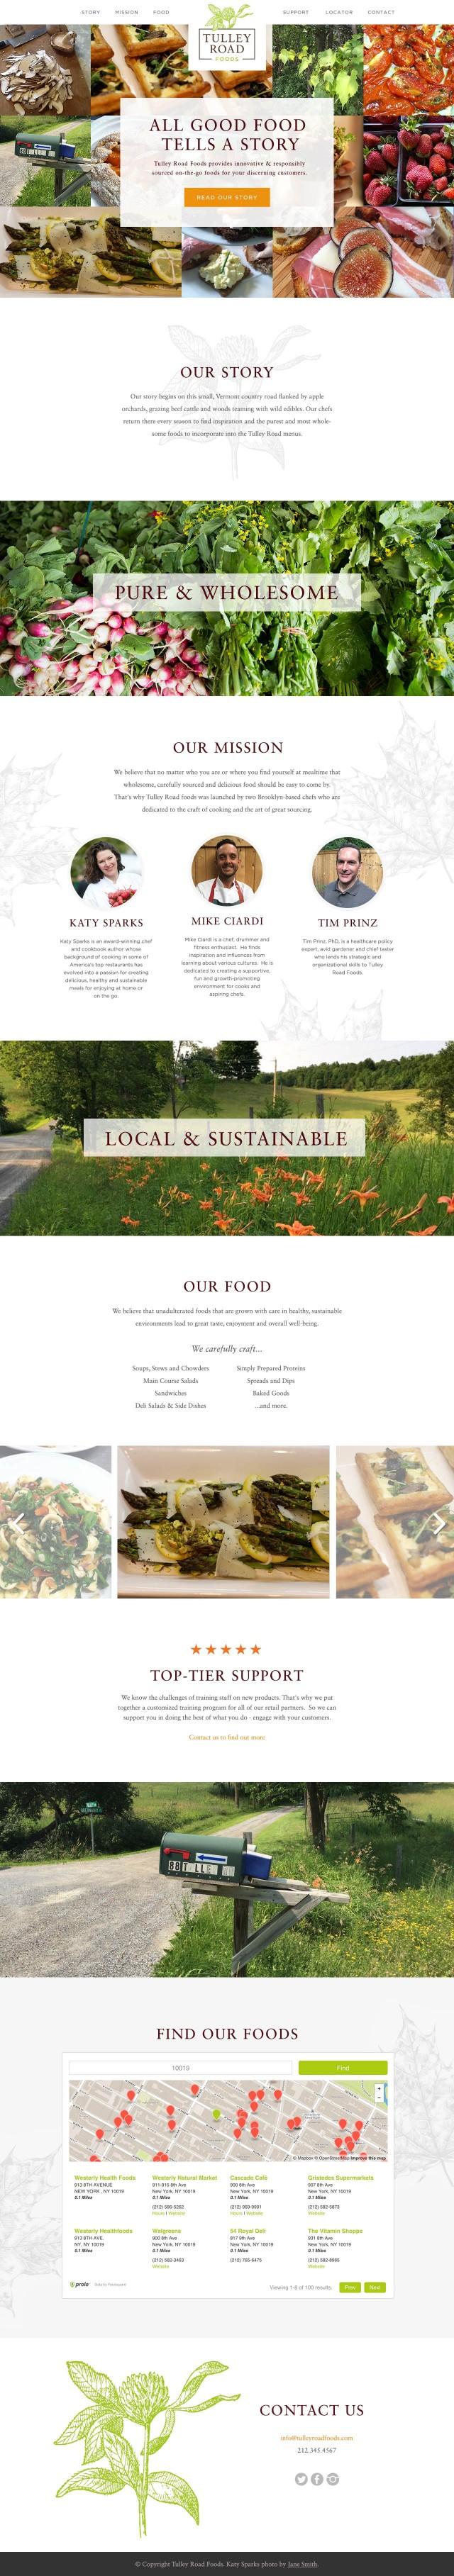 Tulley Road Website Design